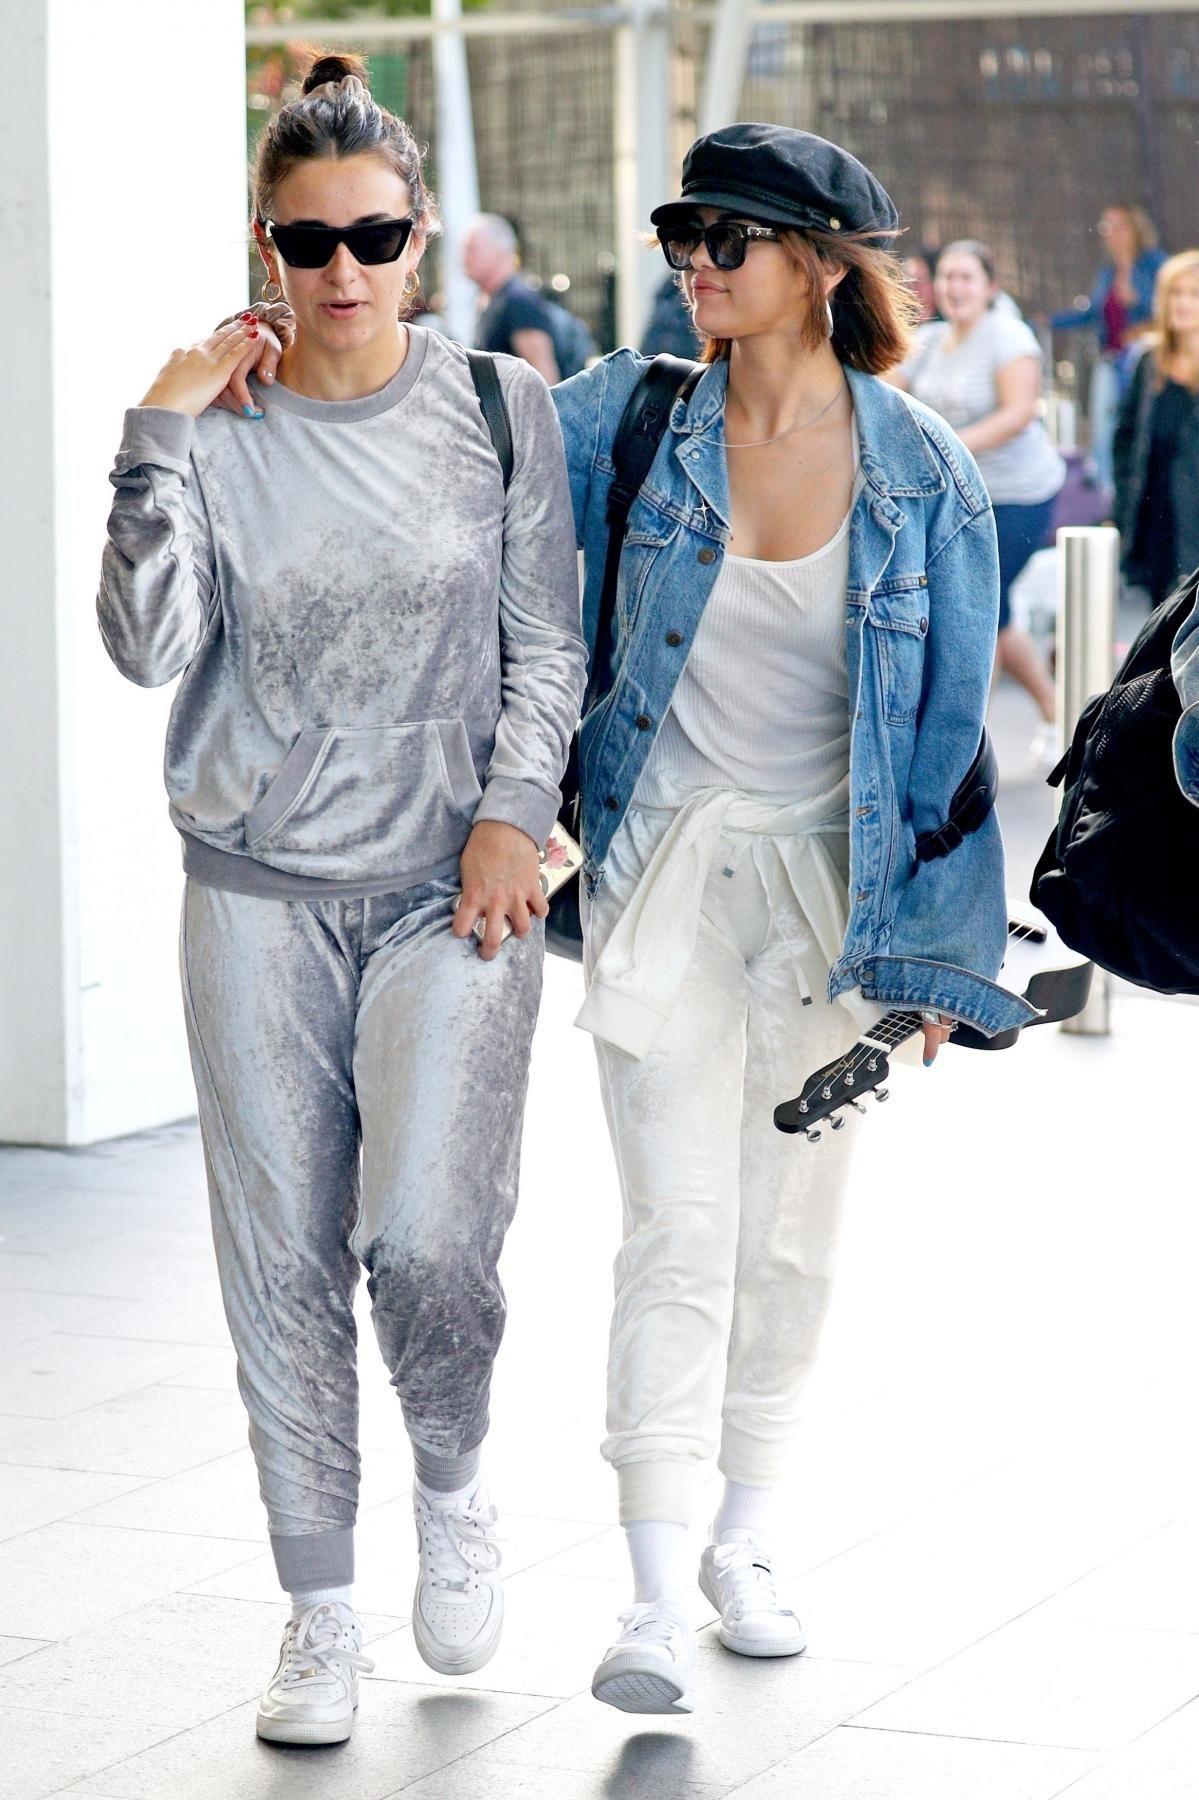 Shoes Selena Gomez Socks Airport Wwwmiifotoscom